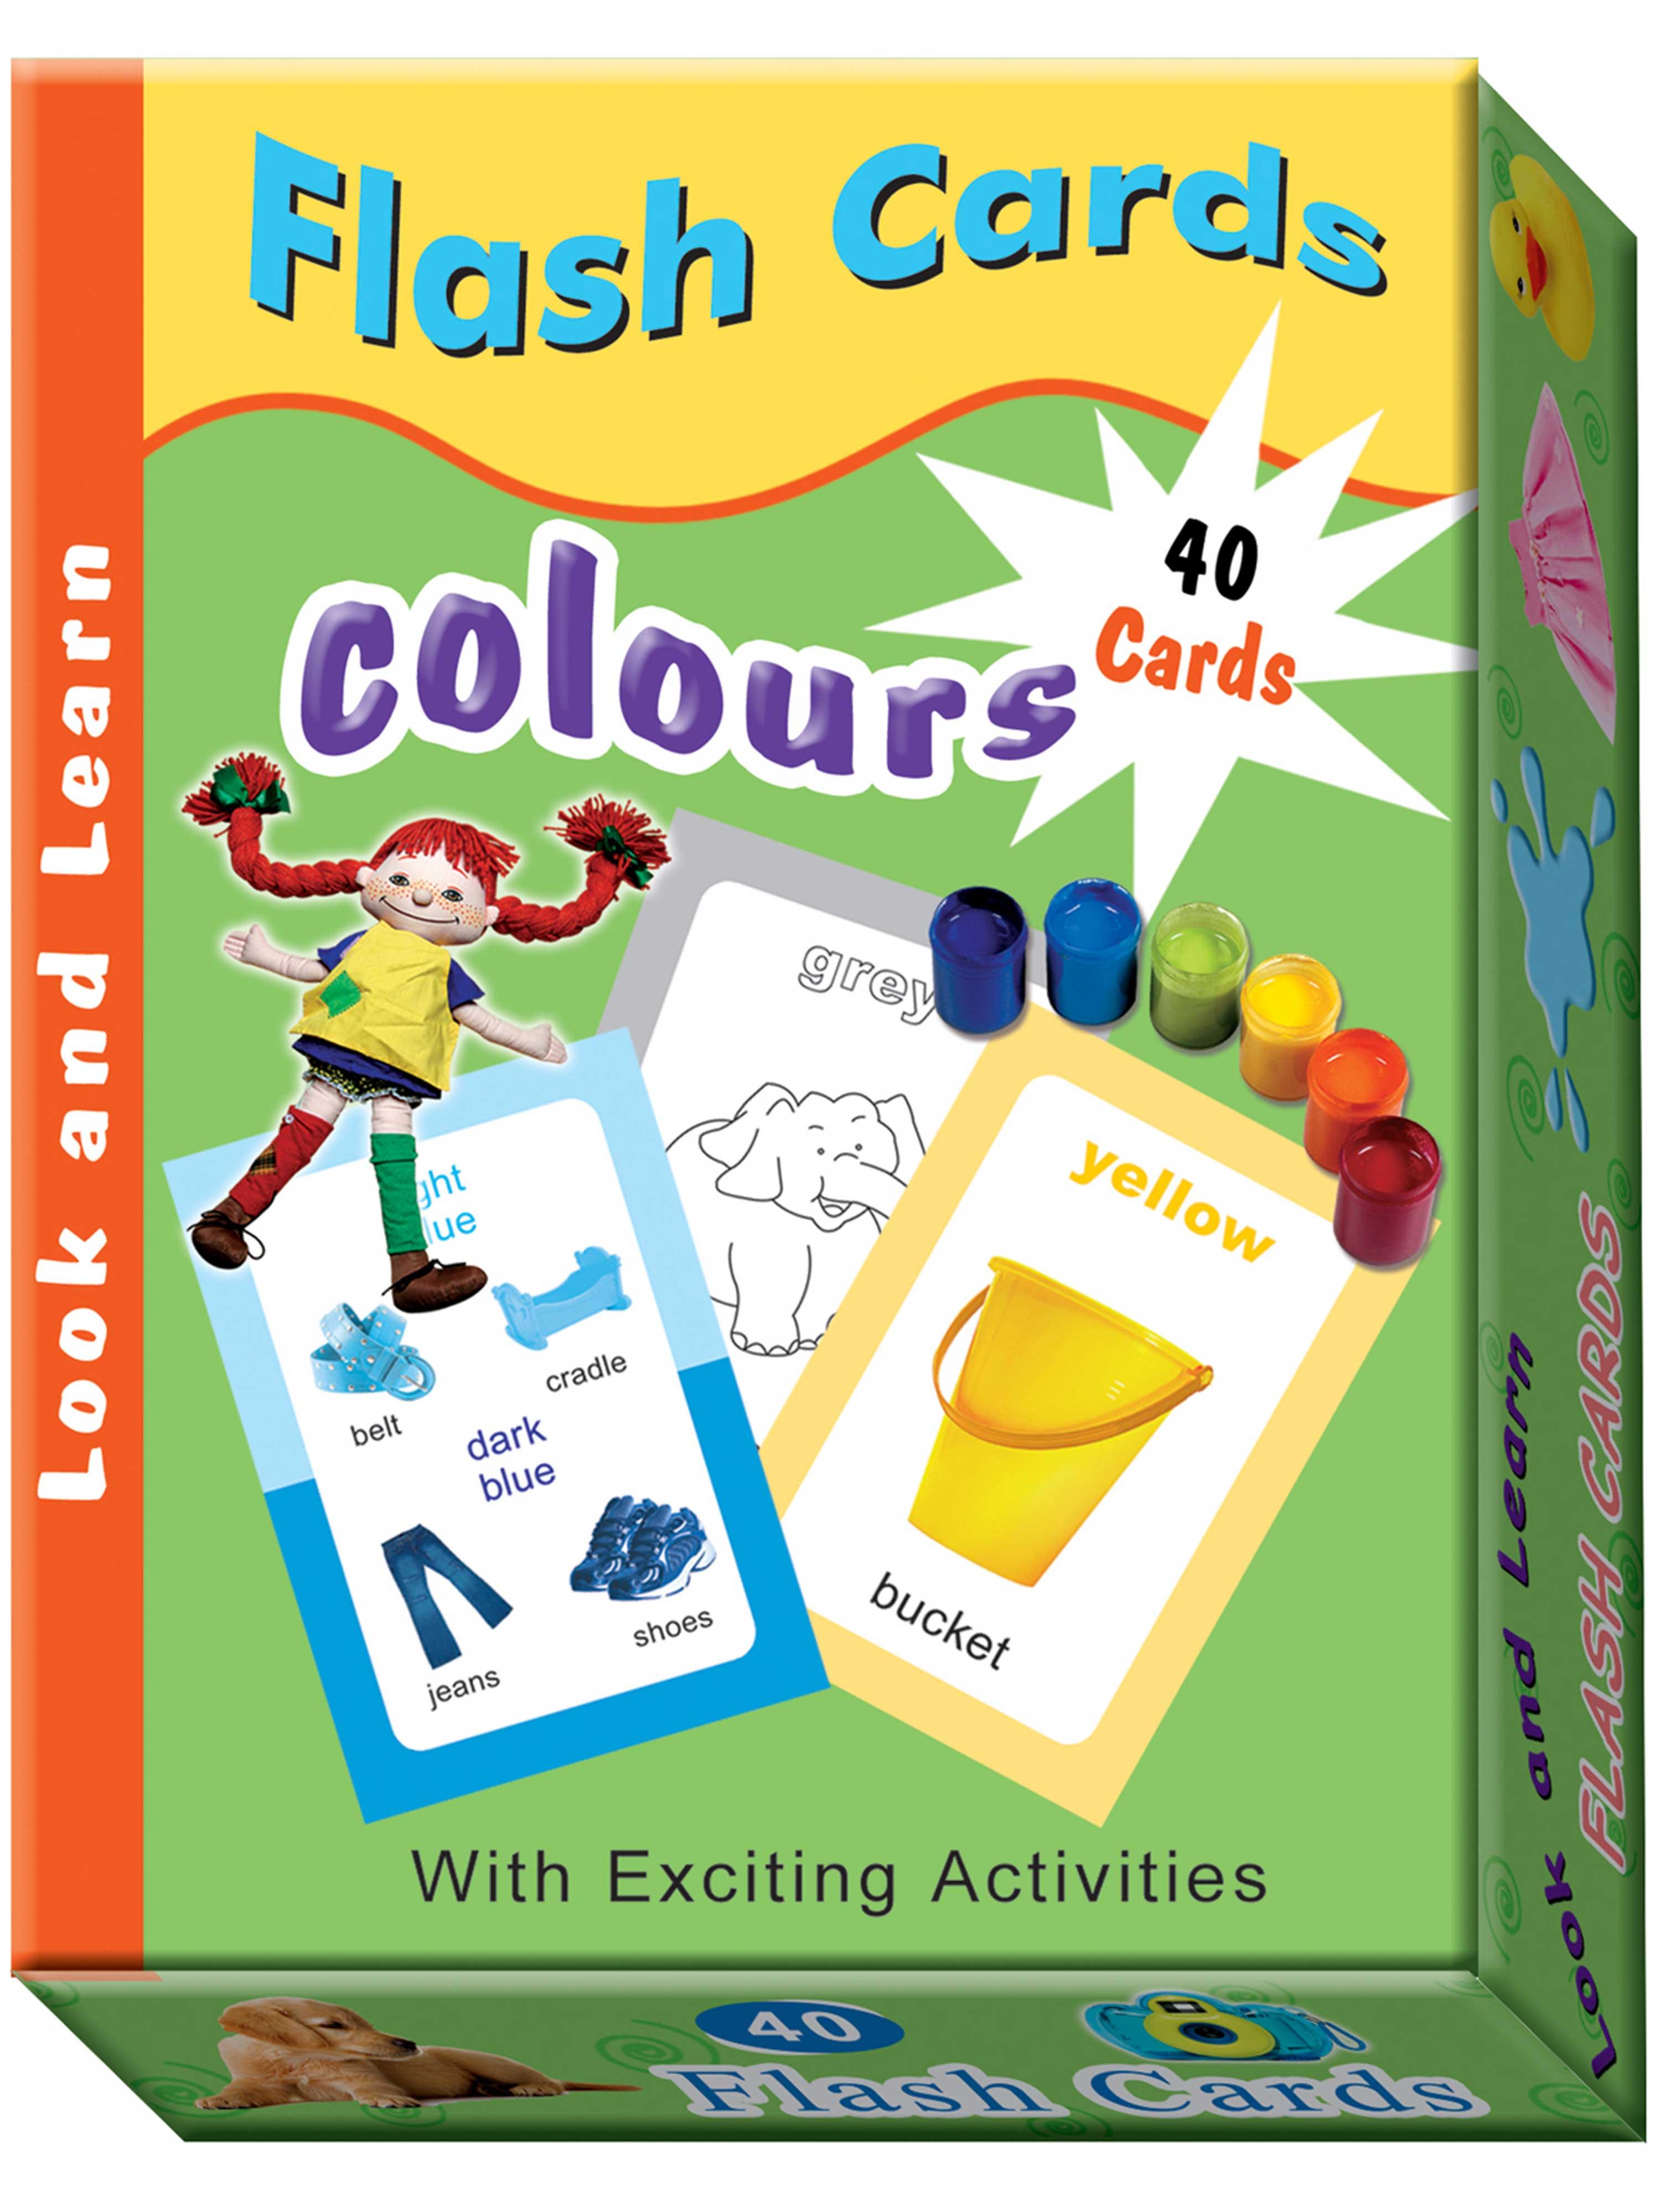 Flash Cards - Colours